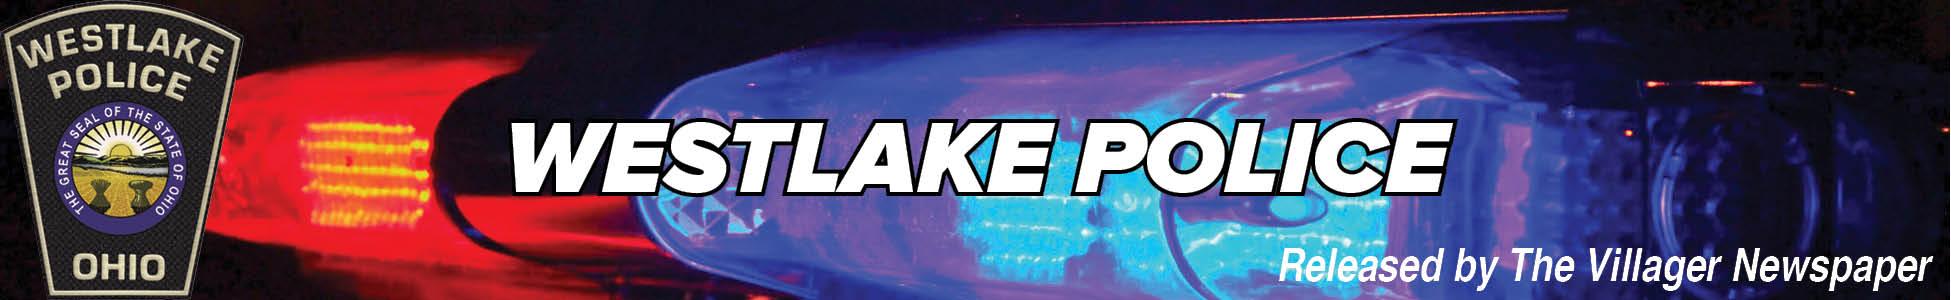 Westlake Police: Pedestrian Killed in Westlake Motor Vehicle